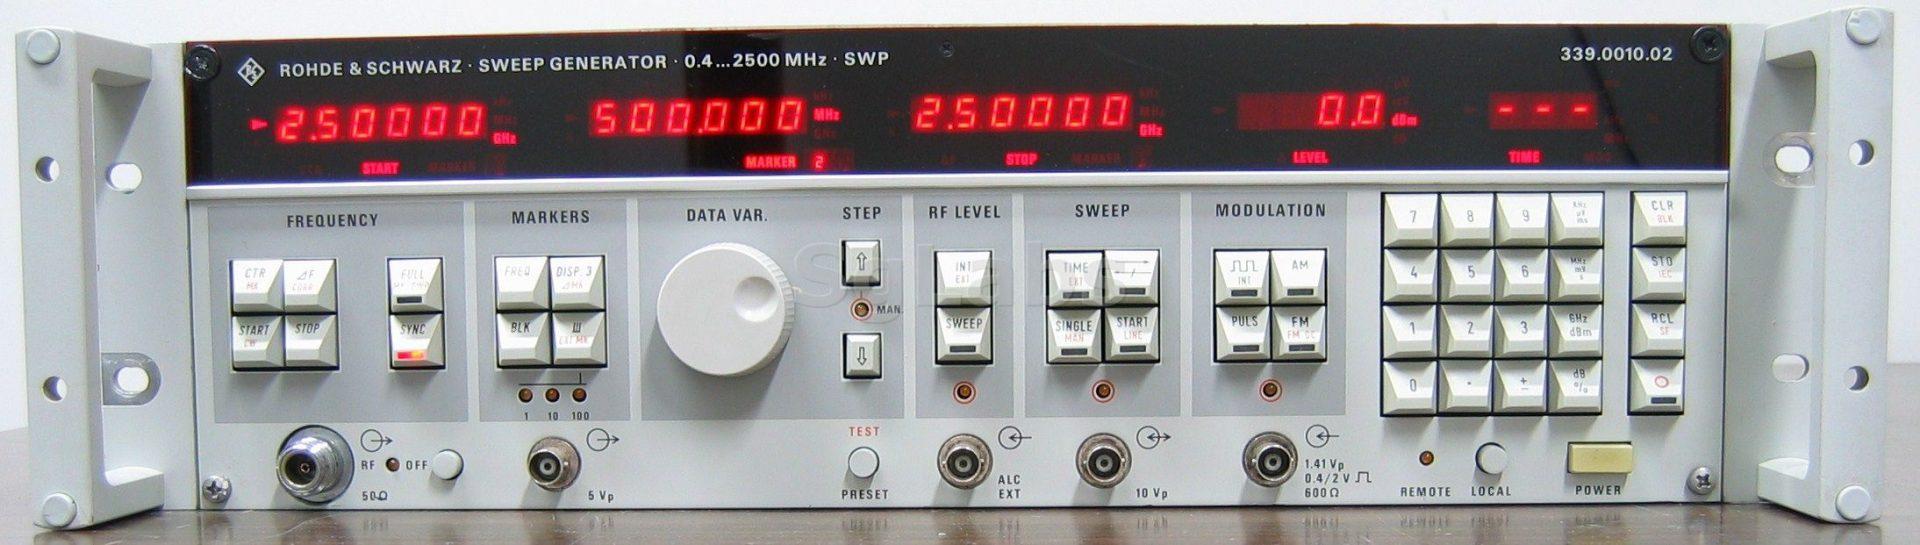 Rohde & Schwarz Swp 2.5 Ghz Sweep Signal Generator